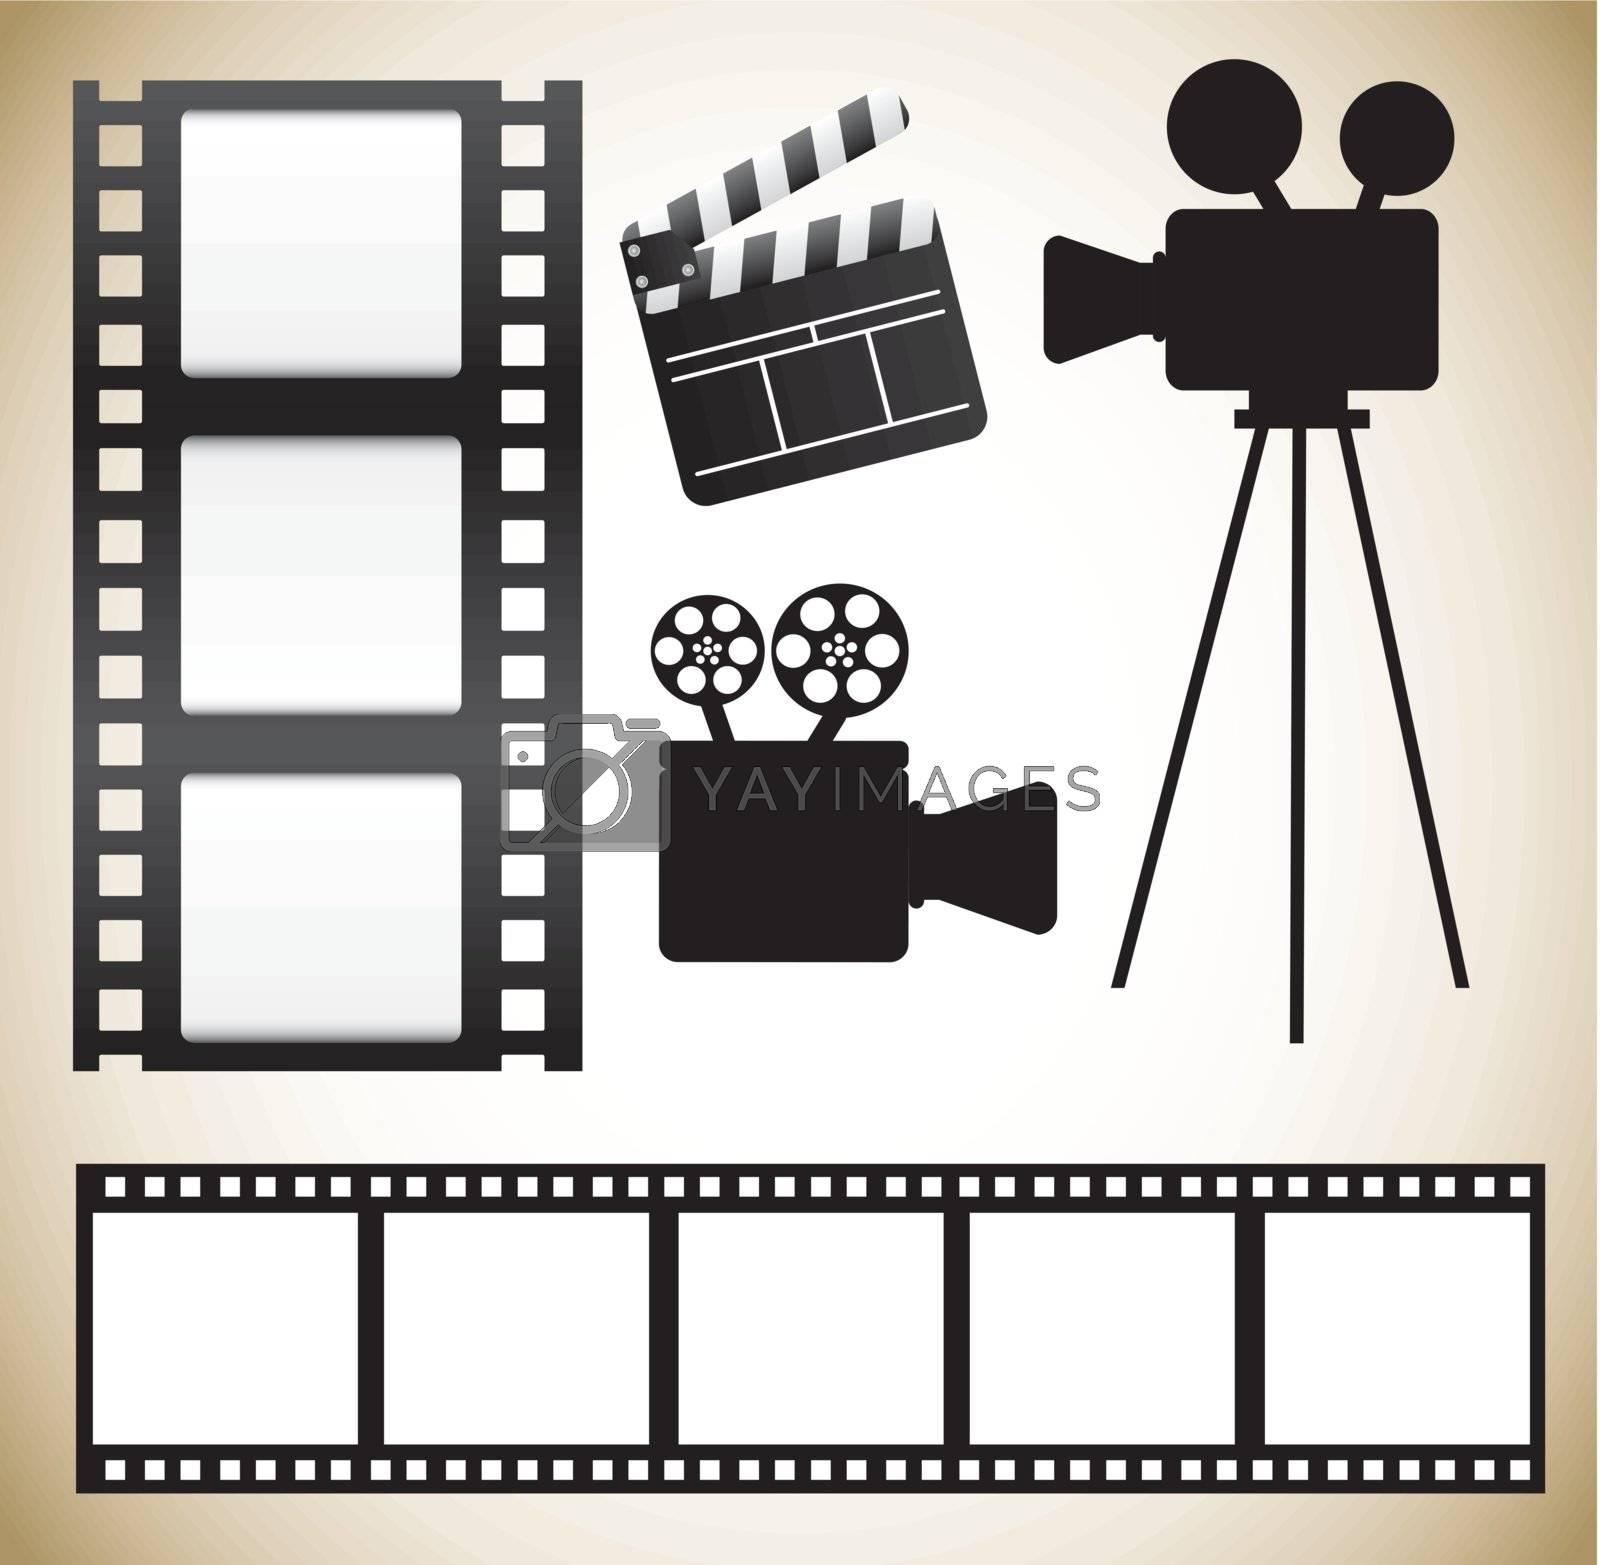 Cinema icons over white background vector illustration